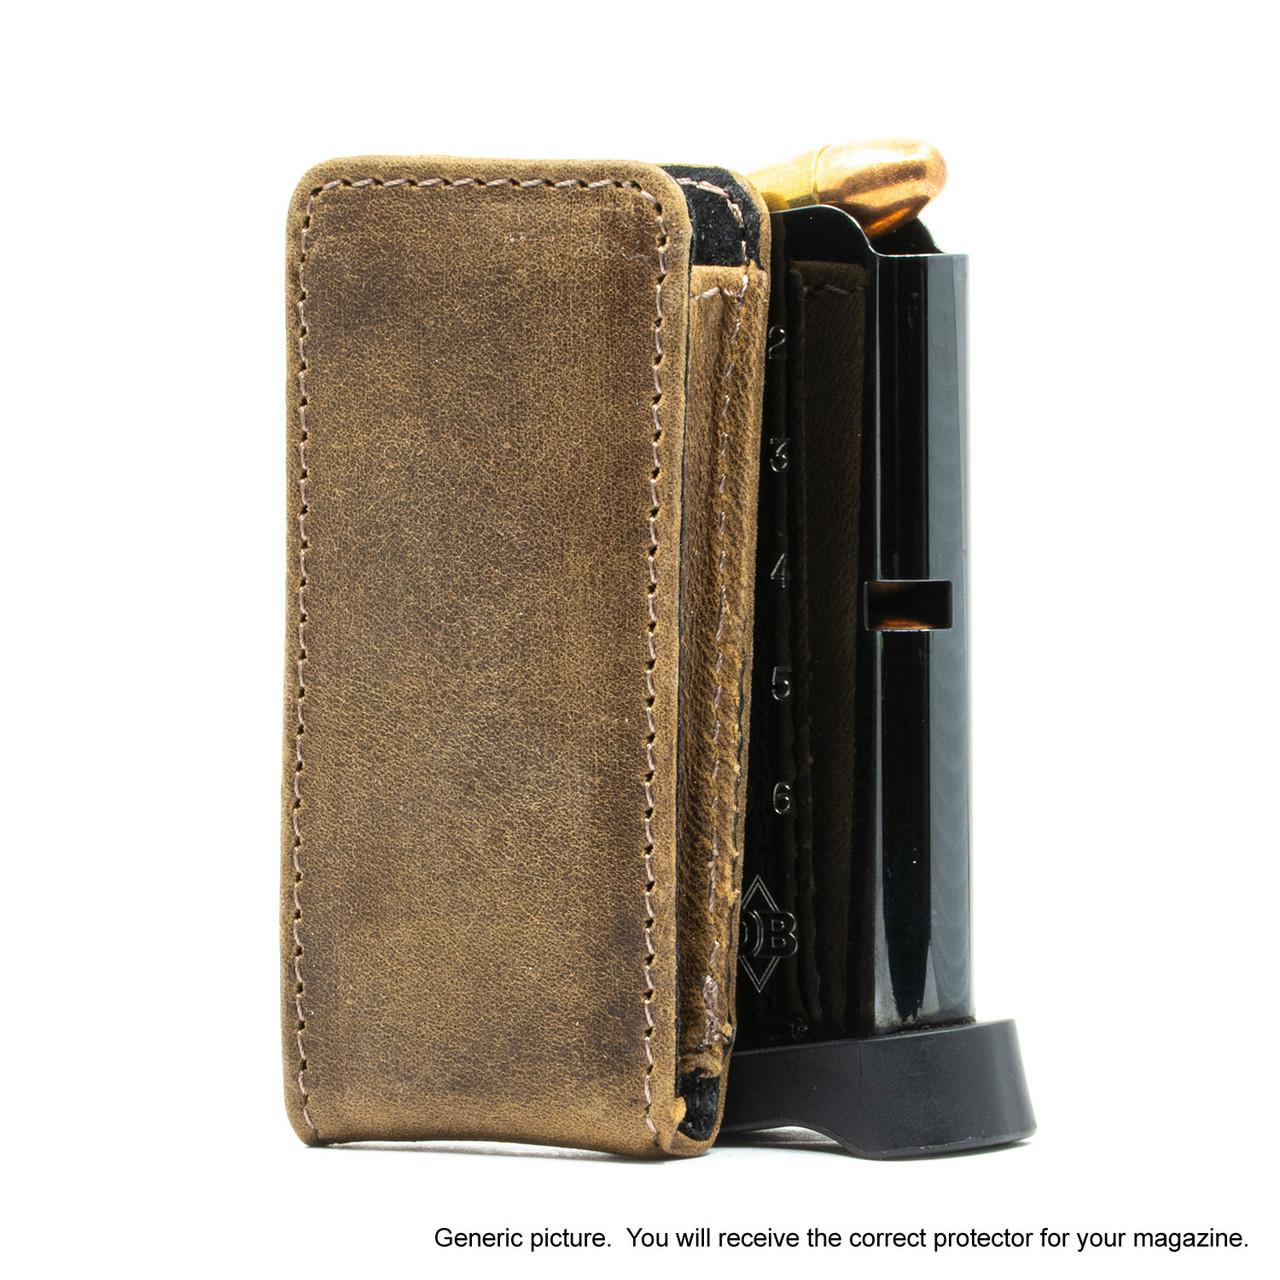 CZ 75 P07 Brown Freedom Magazine Pocket Protector